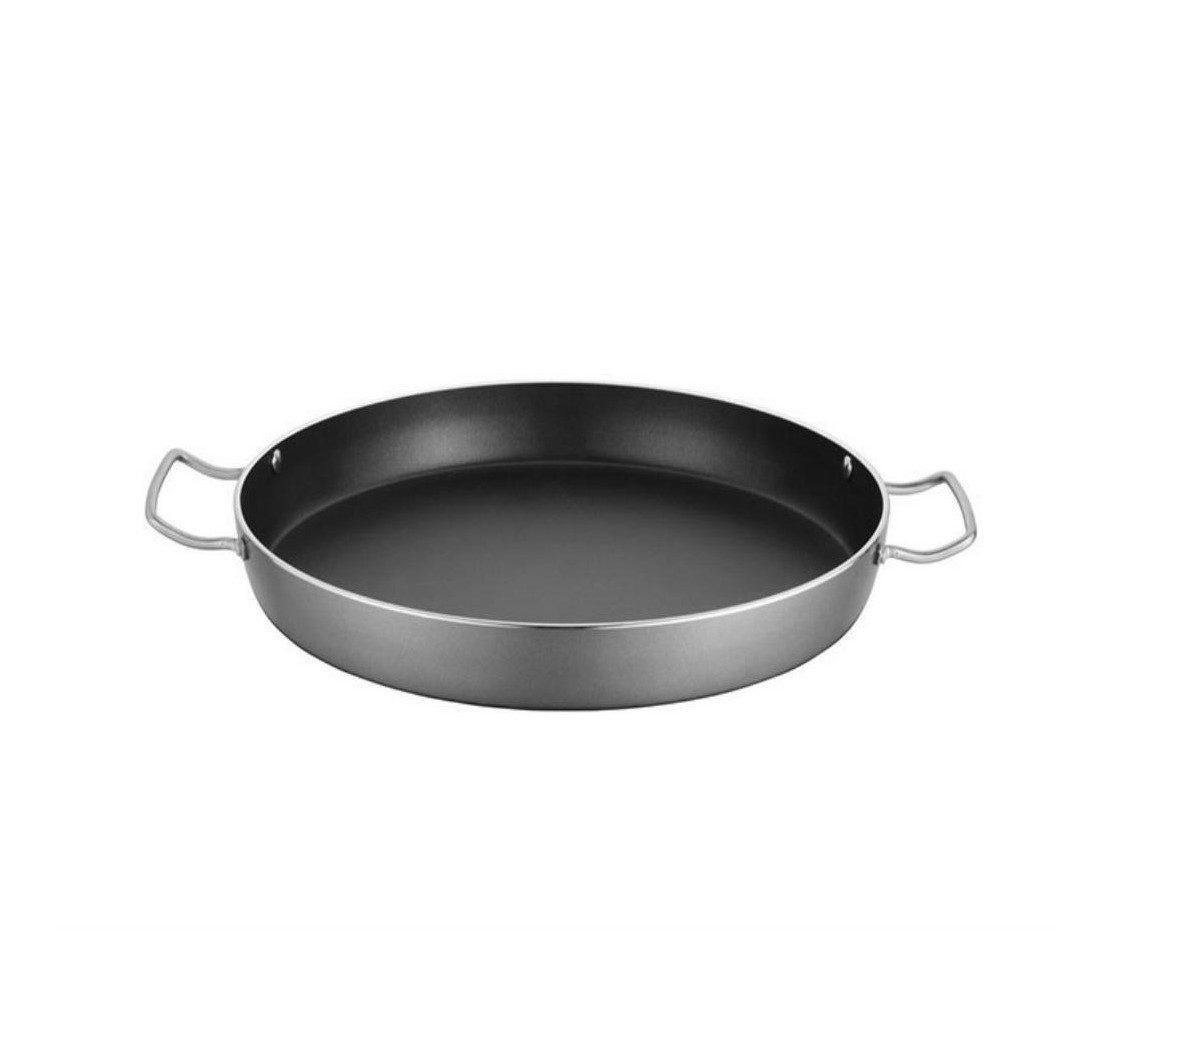 Cadac Chef Pan 36cm